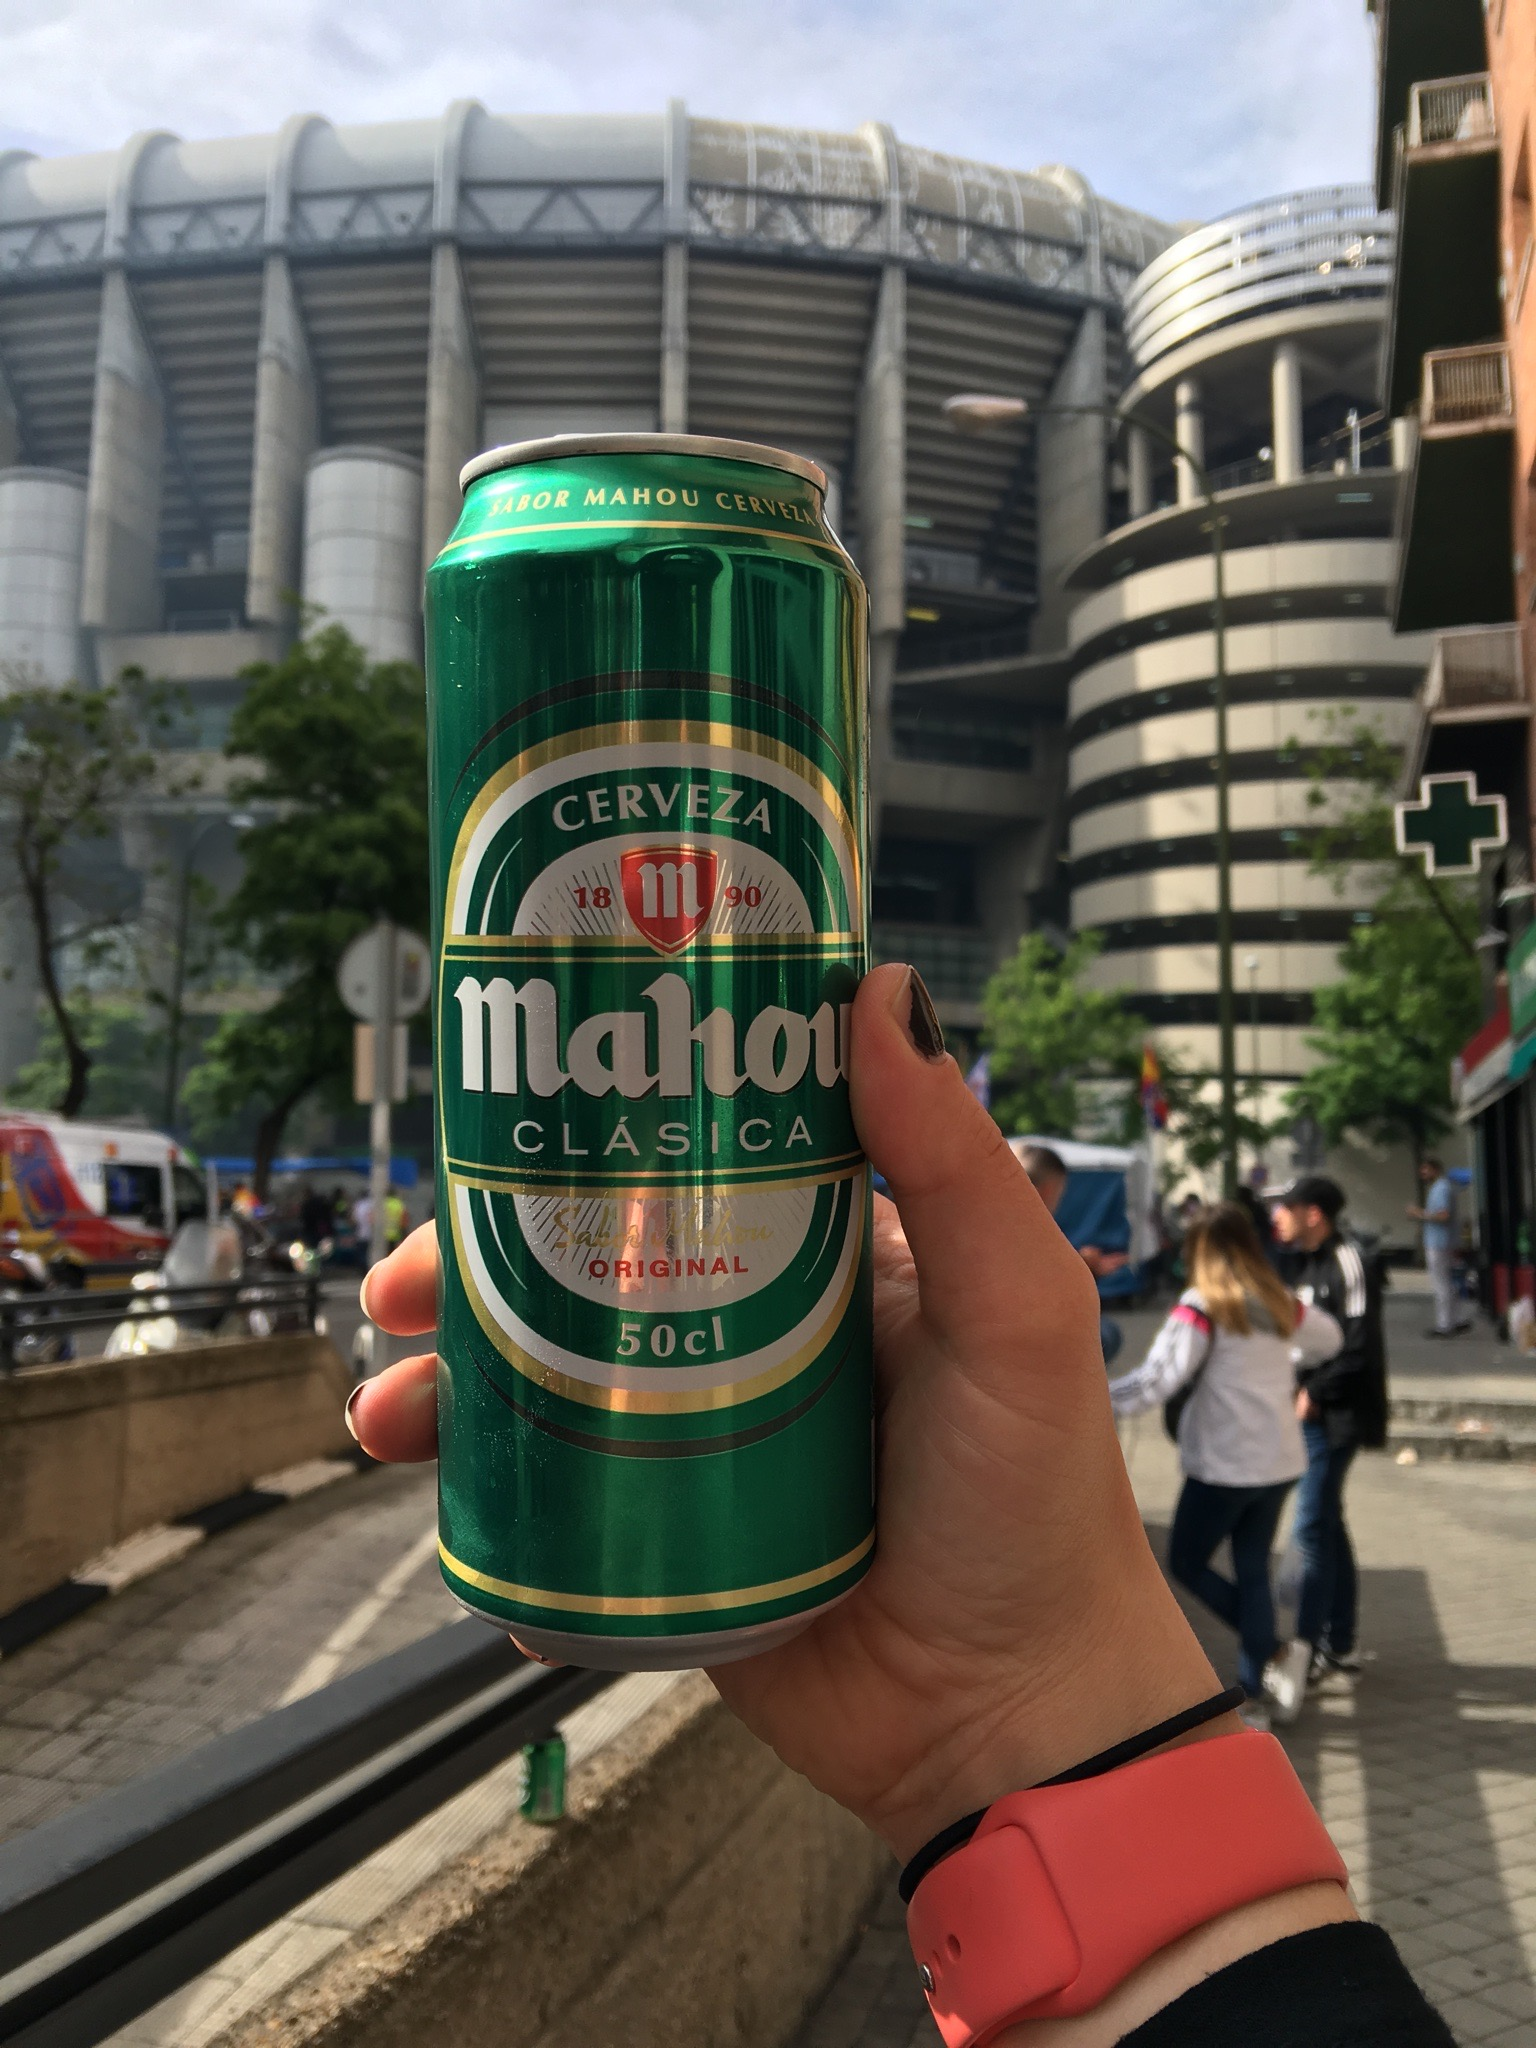 Mahou (cheap Spanish beer)